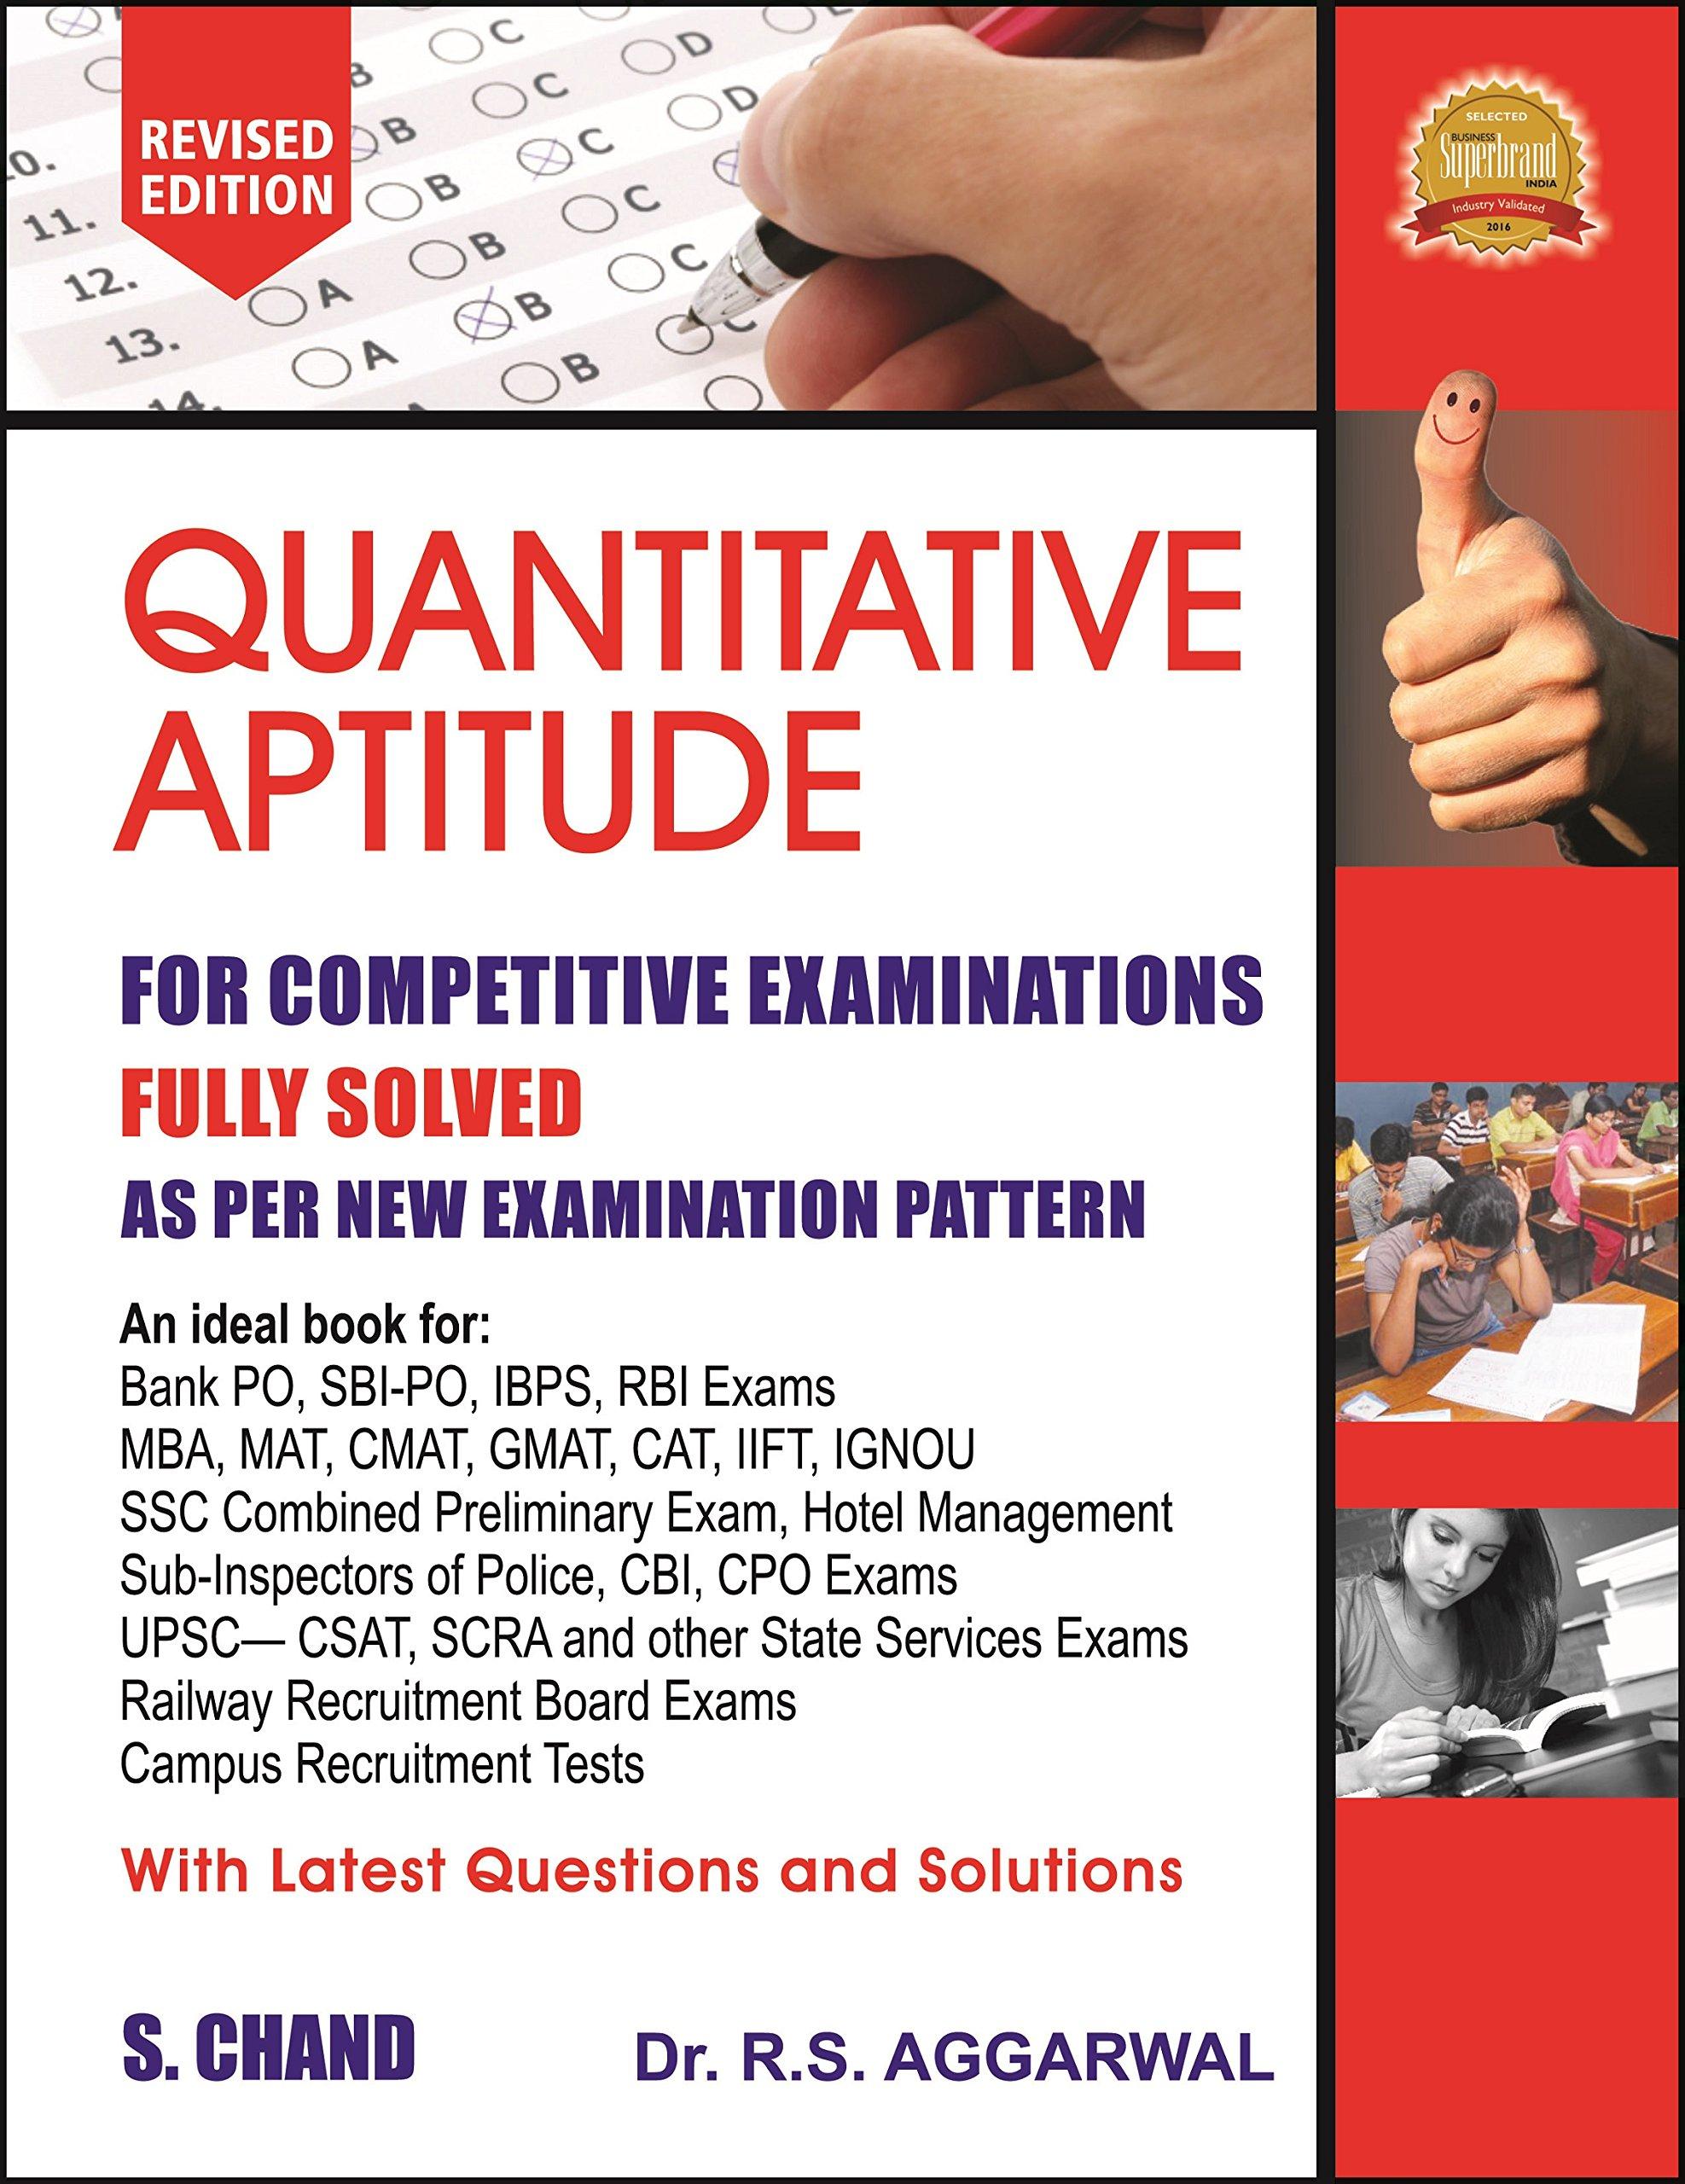 Buy Quantitative Aptitude for petitive Examinations Book line at Low Prices in India